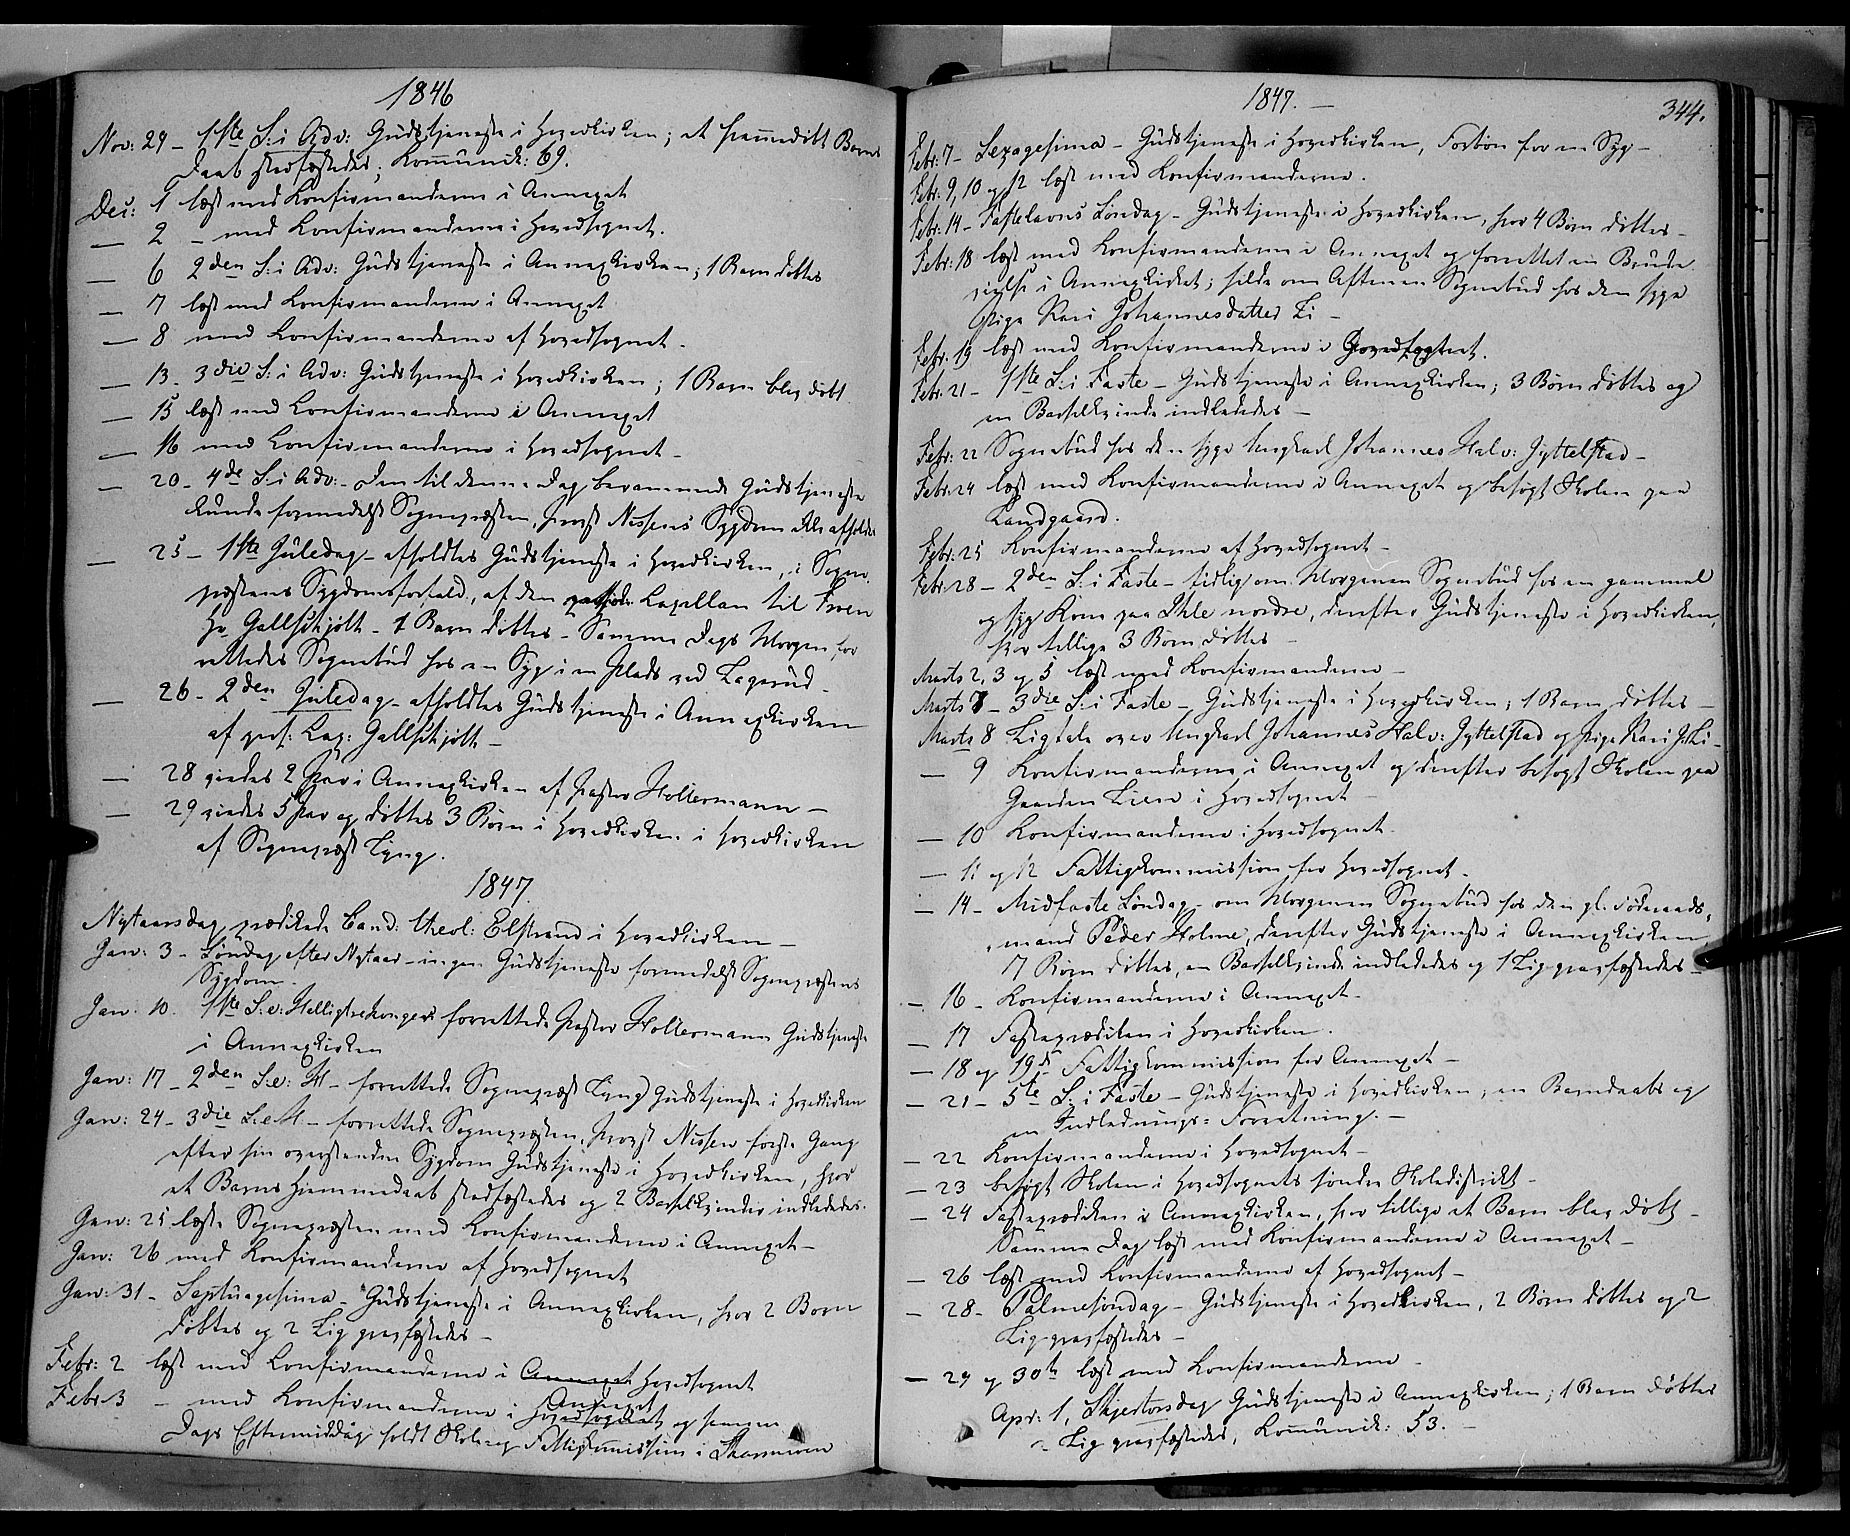 SAH, Øyer prestekontor, Ministerialbok nr. 5, 1842-1857, s. 344